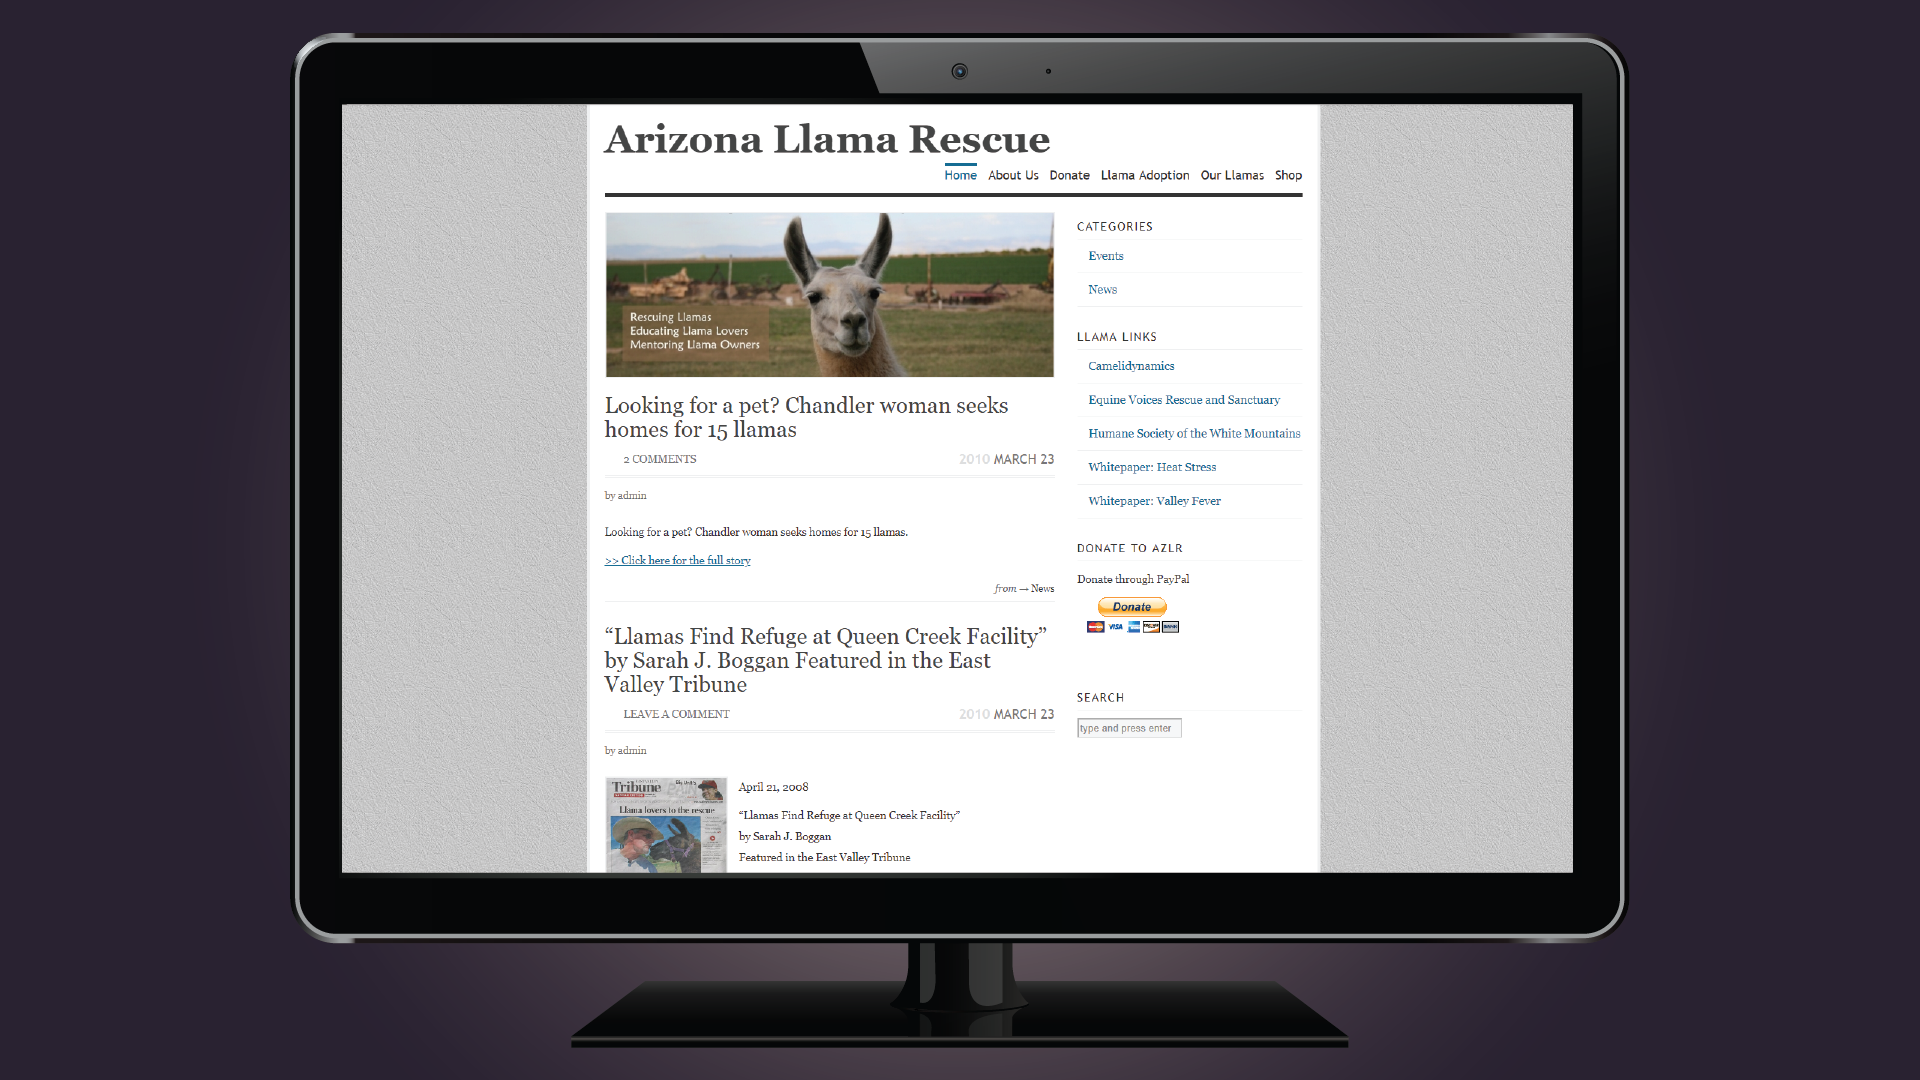 Arizona Llama Rescue